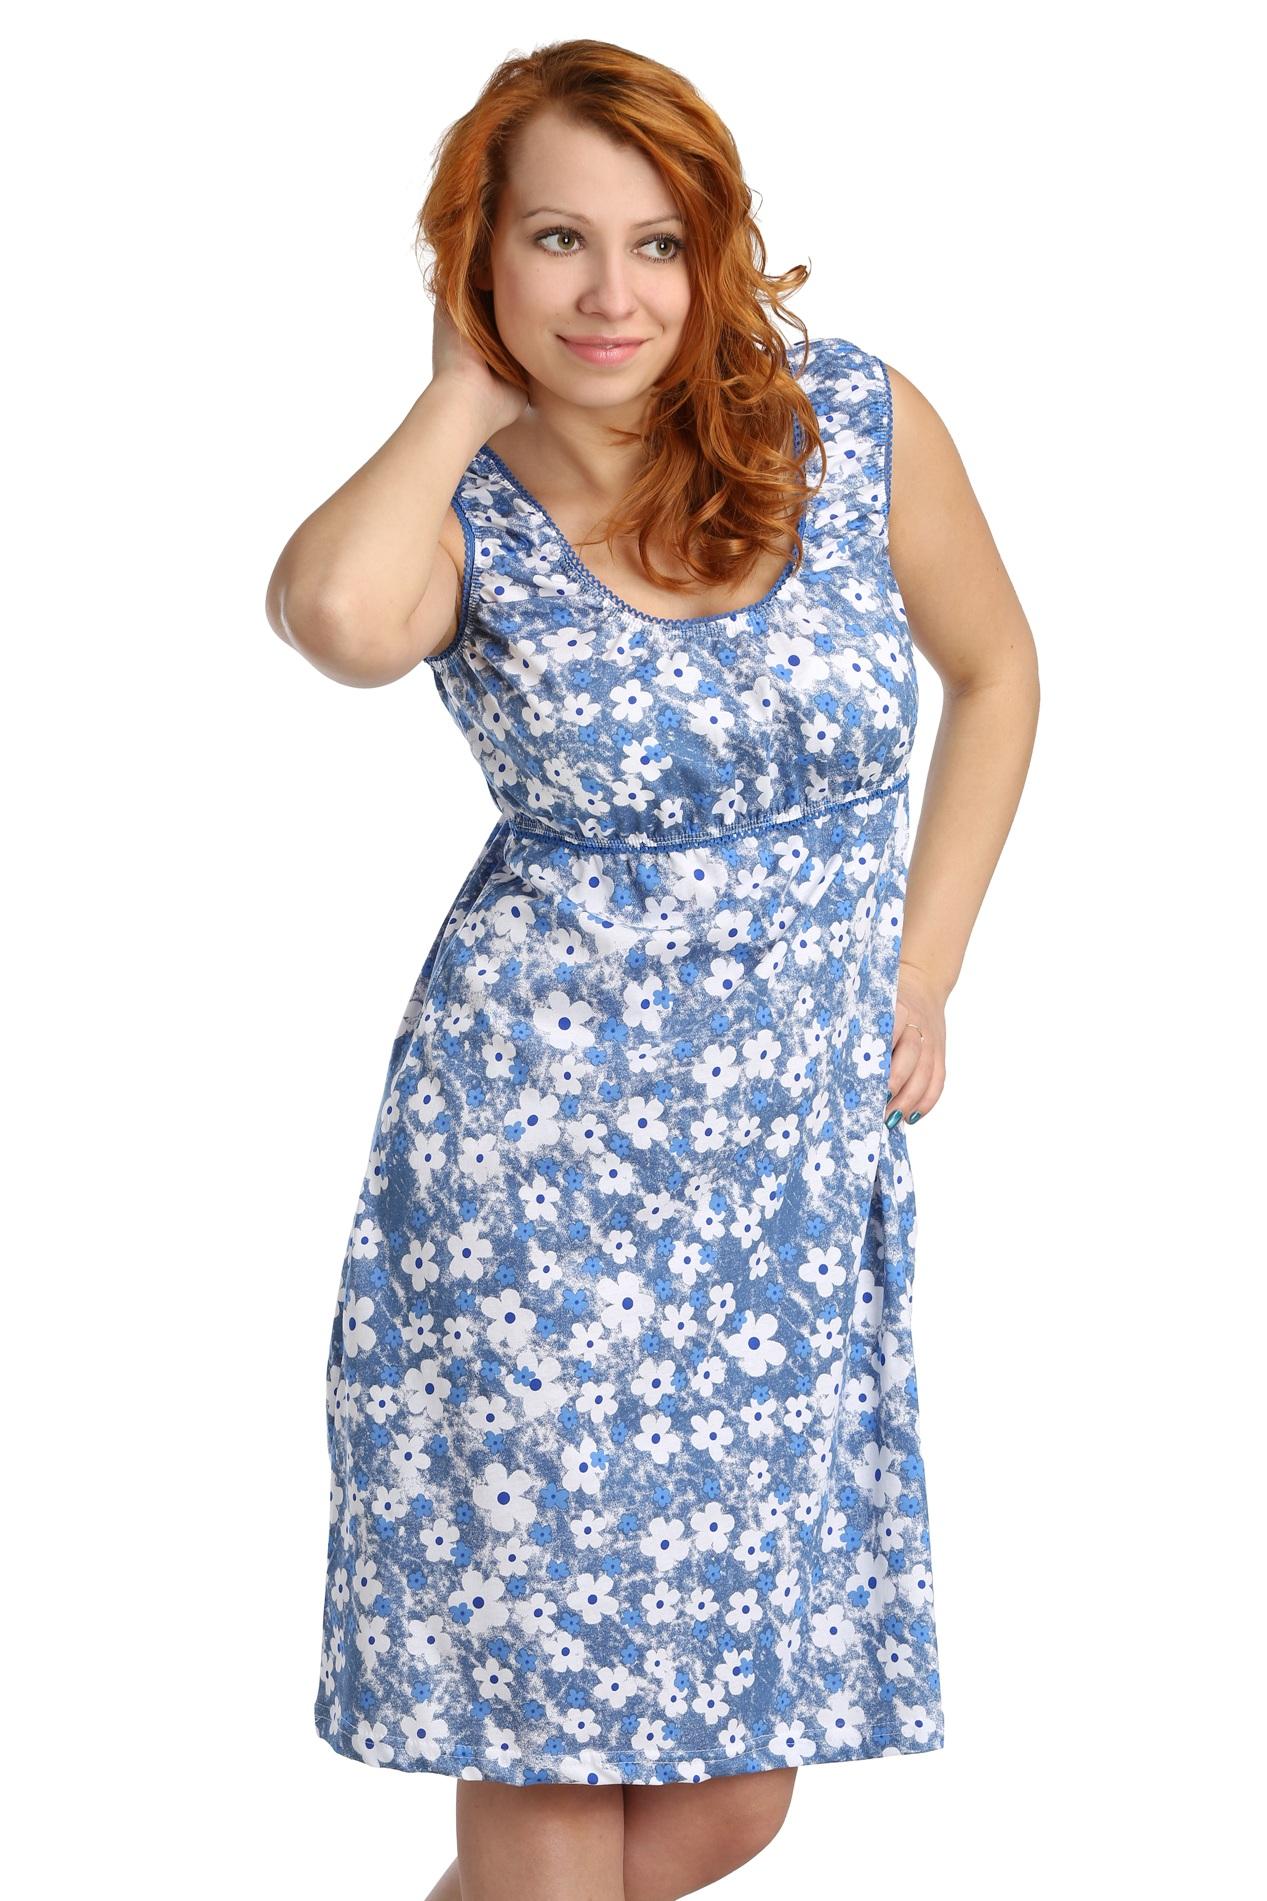 Жен. платье арт. 16-0099 Голубой р. 50Платья<br>Обхват груди:100 см<br>Обхват талии:82 см<br>Обхват бедер:108 см<br>Длина по спинке:100 см<br>Рост:164-170 см<br><br>Тип: Жен. платье<br>Размер: 50<br>Материал: Кулирка